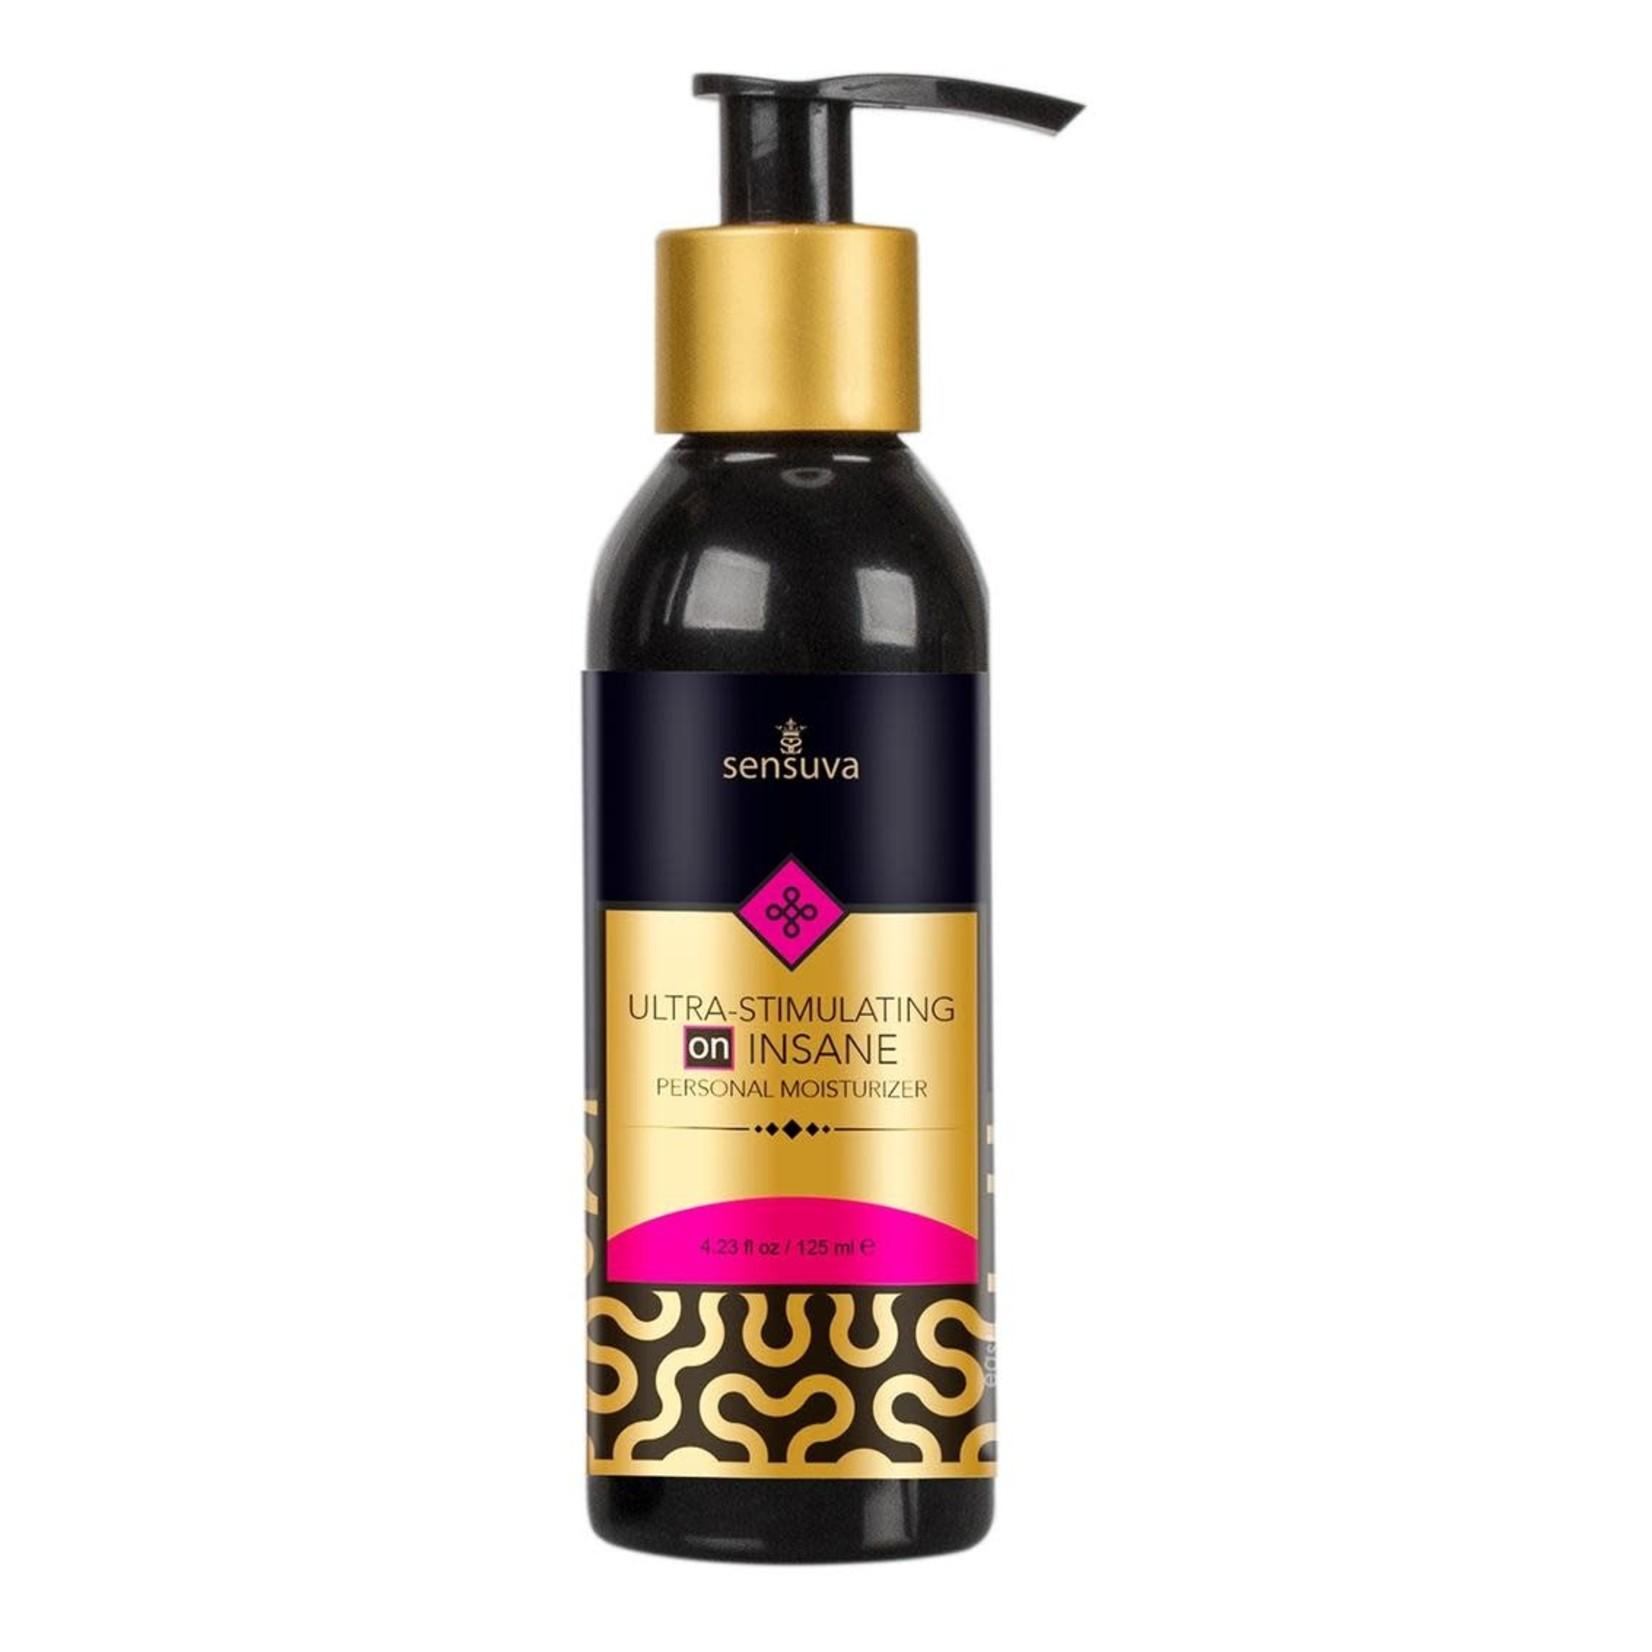 Ultra-Stimulating On Insane Personal Moisturizer - Unscented 4 fl. oz. Bottle